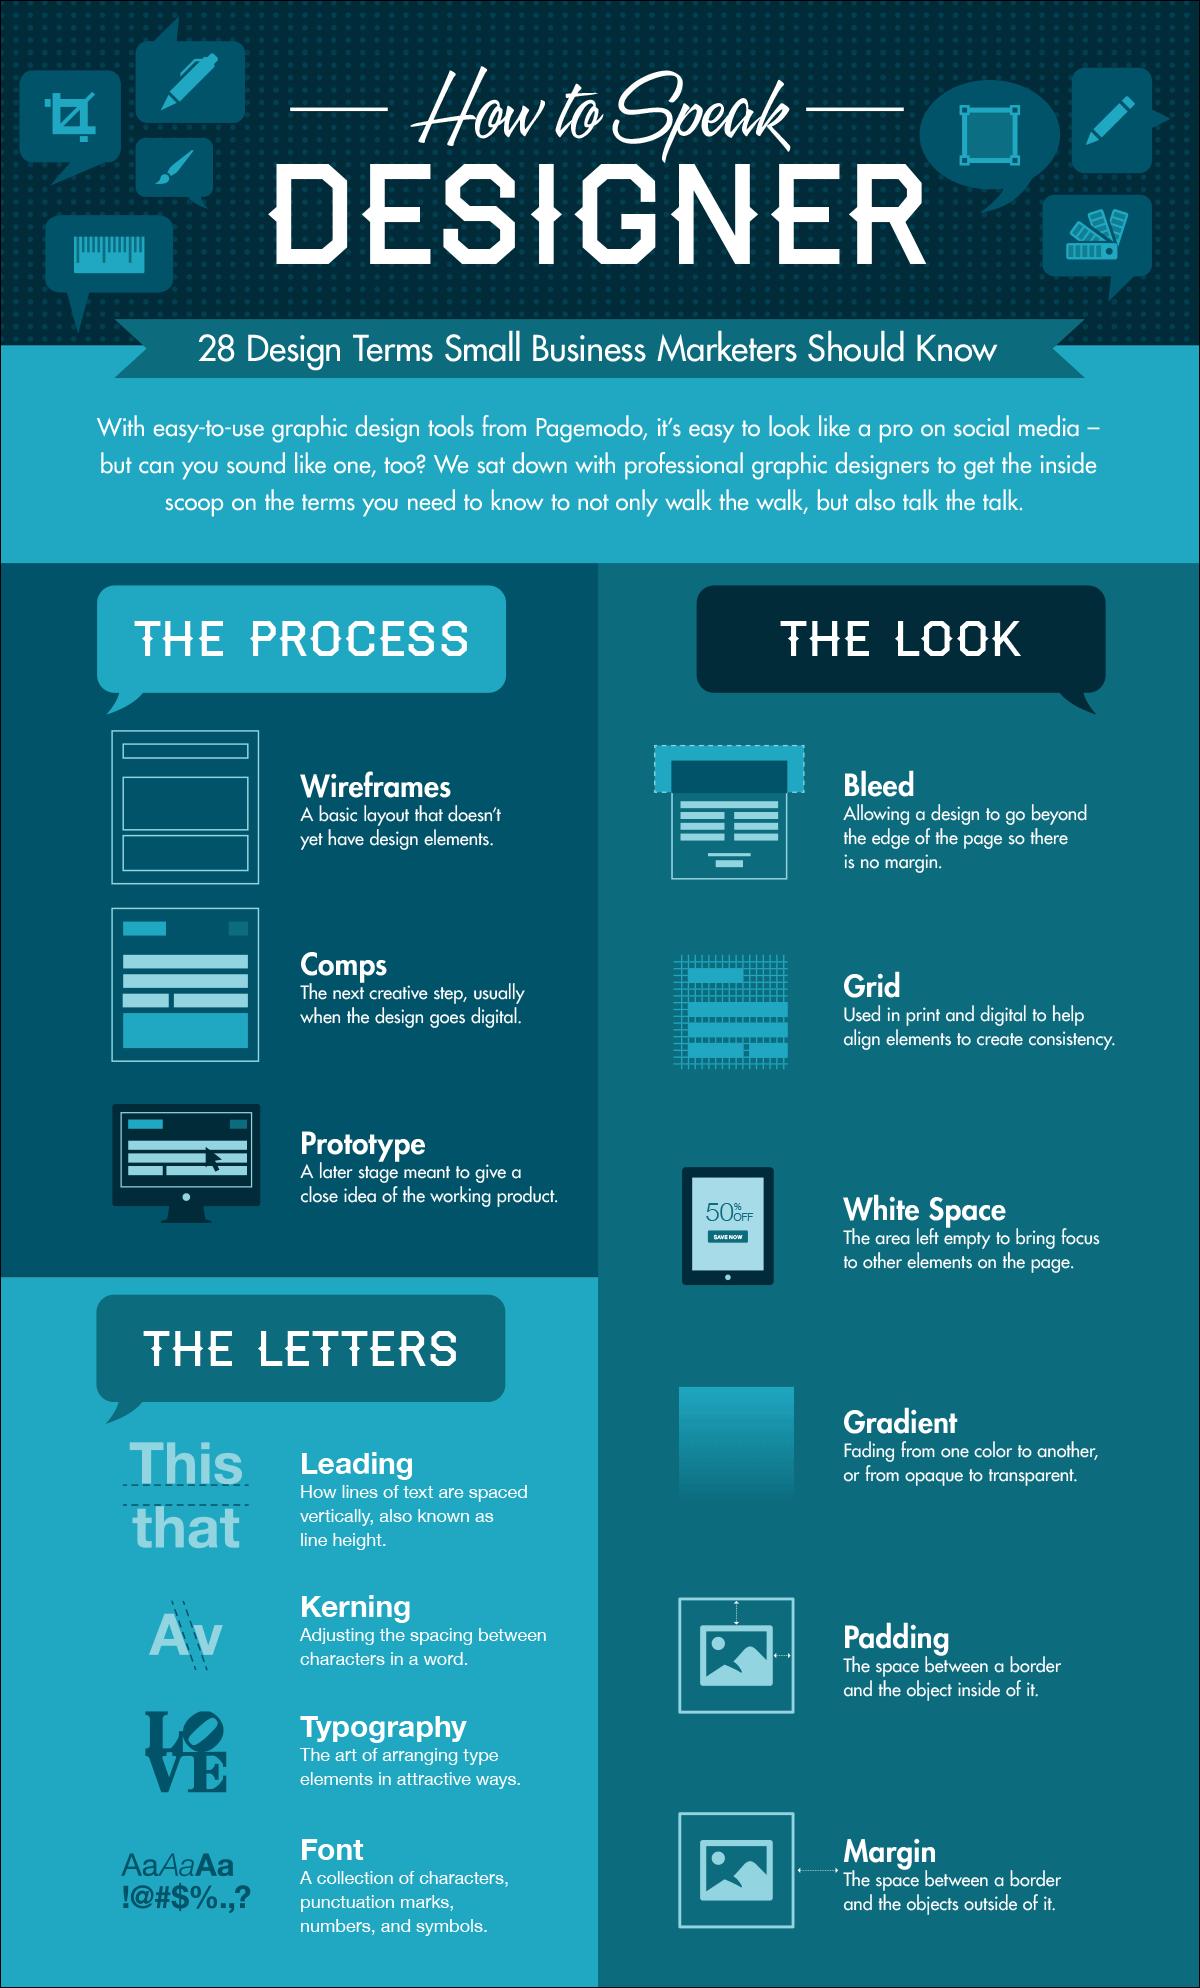 Graphic-Design-How-toSpeak-Designer best infographics best infographic examples